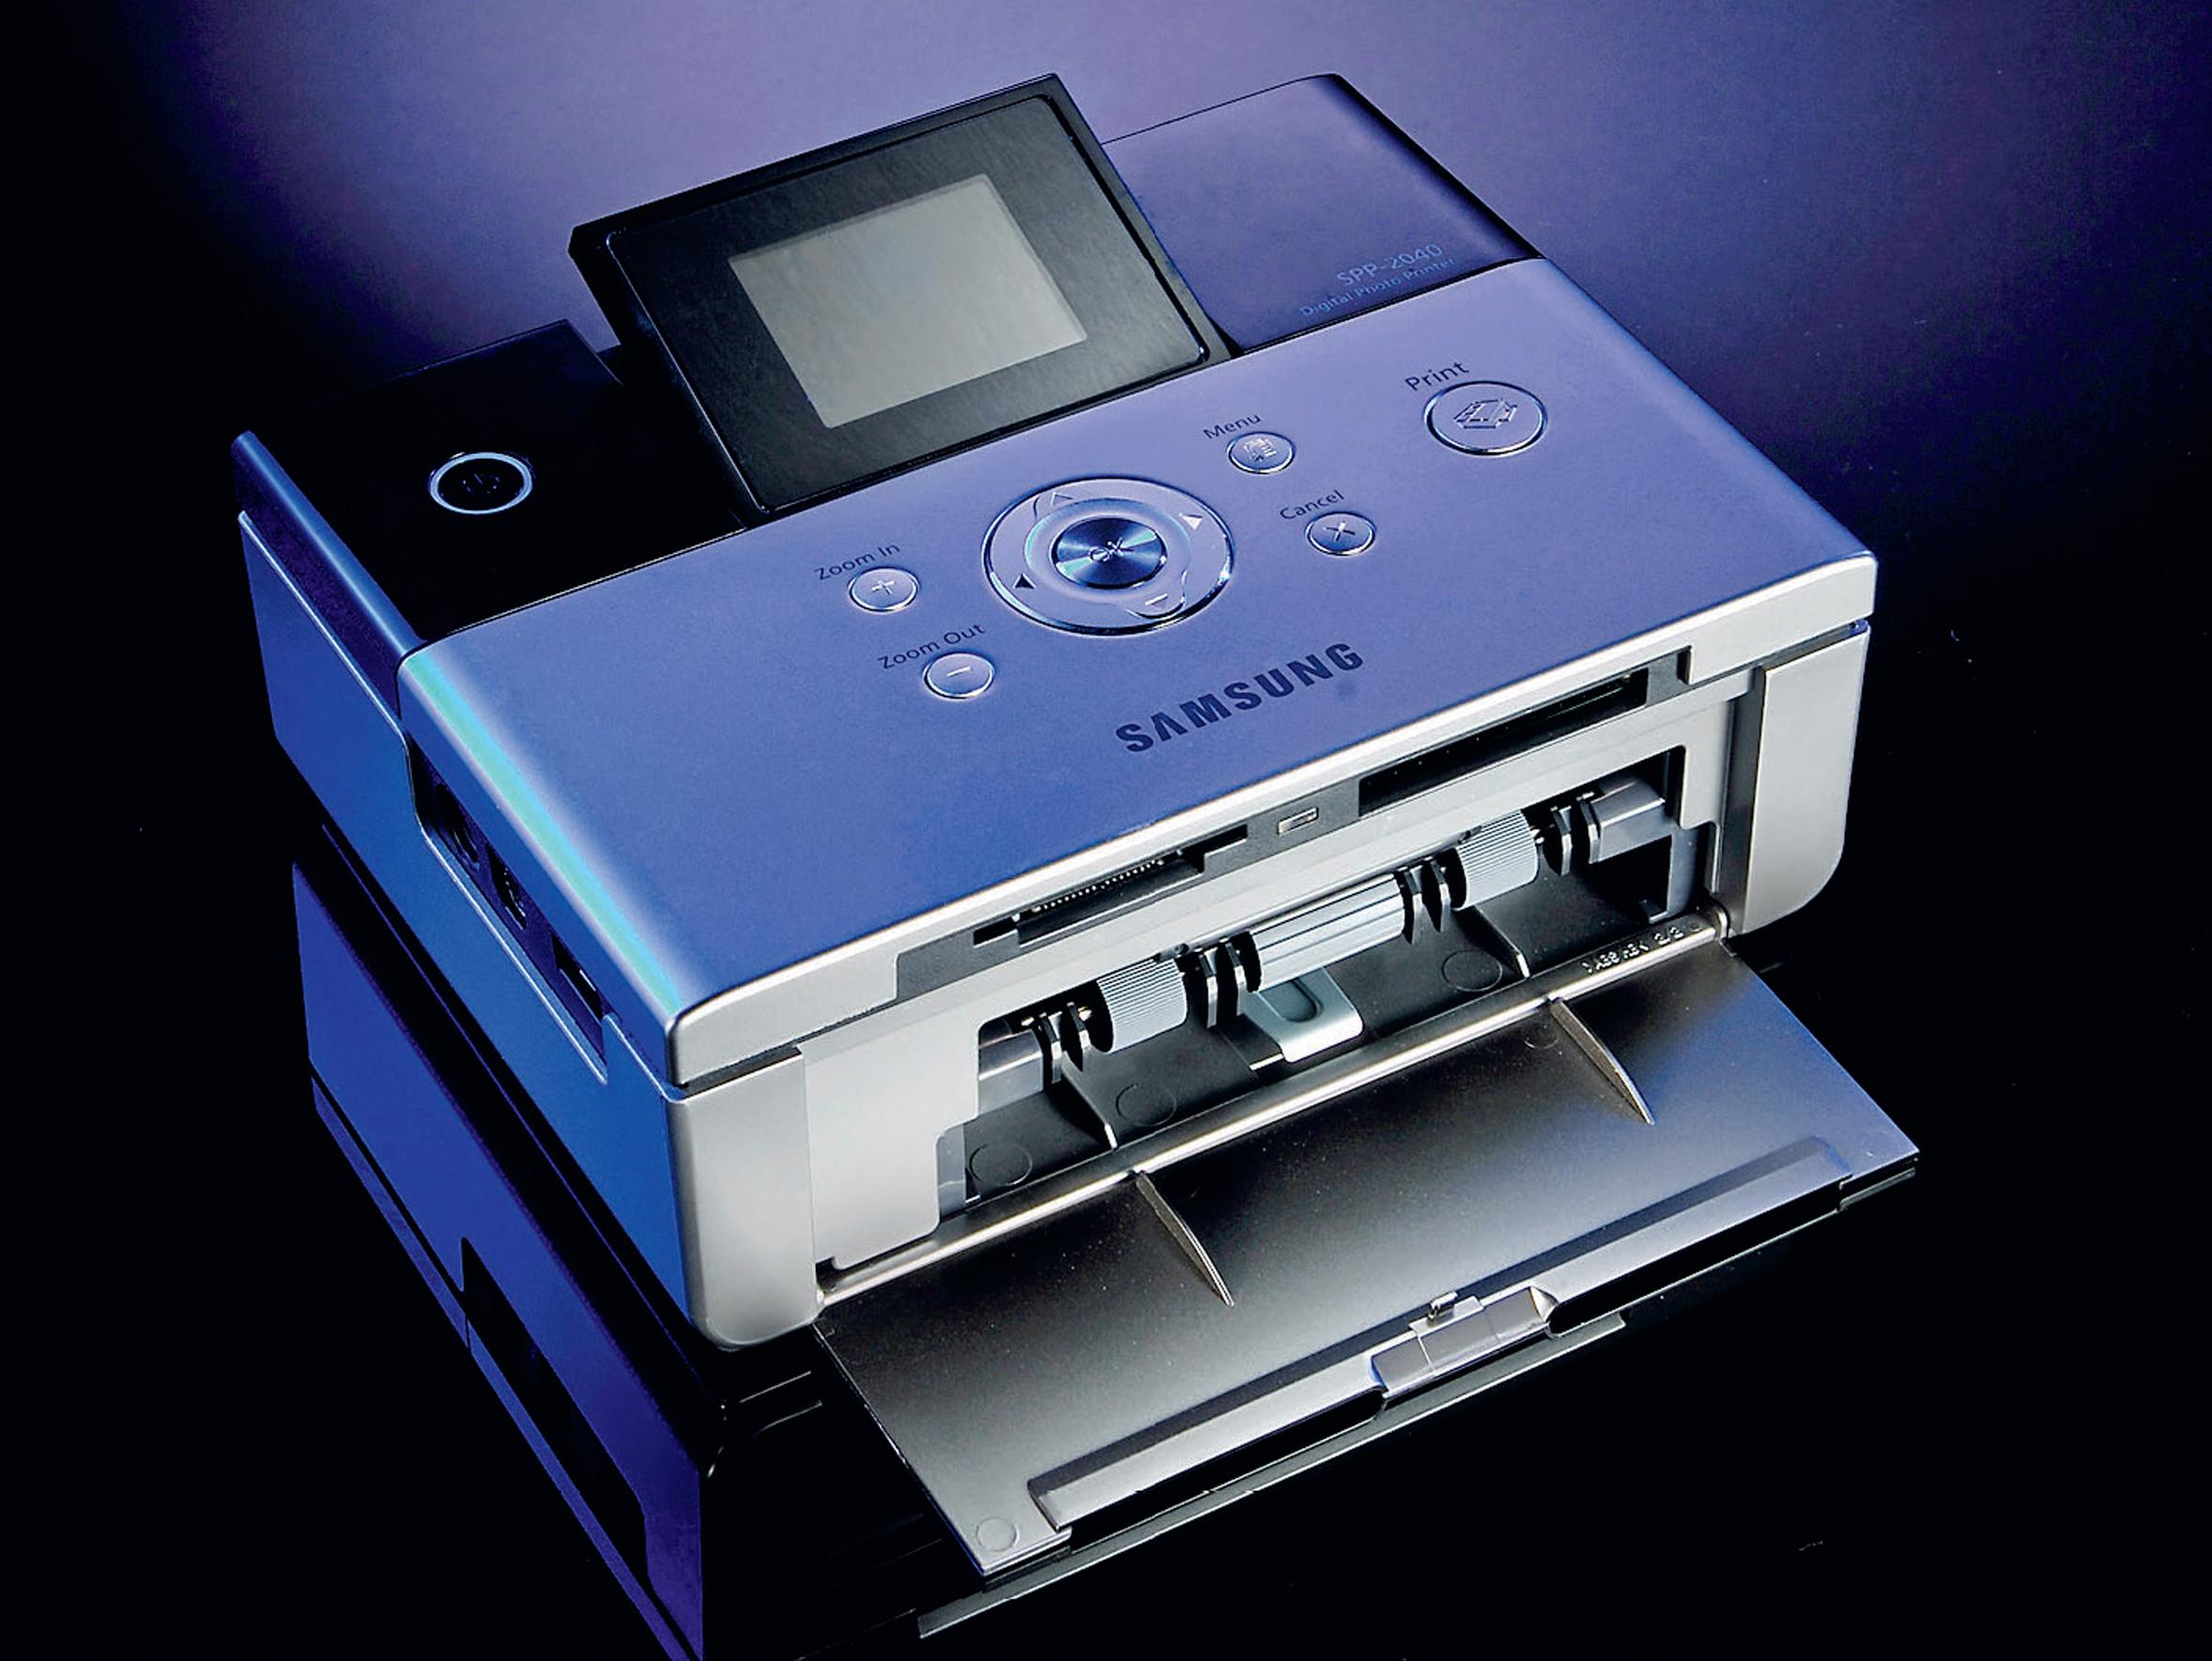 Troubleshooting the 58.04 Error on the HP P3015 - Printer Samsung 2040 photo printer